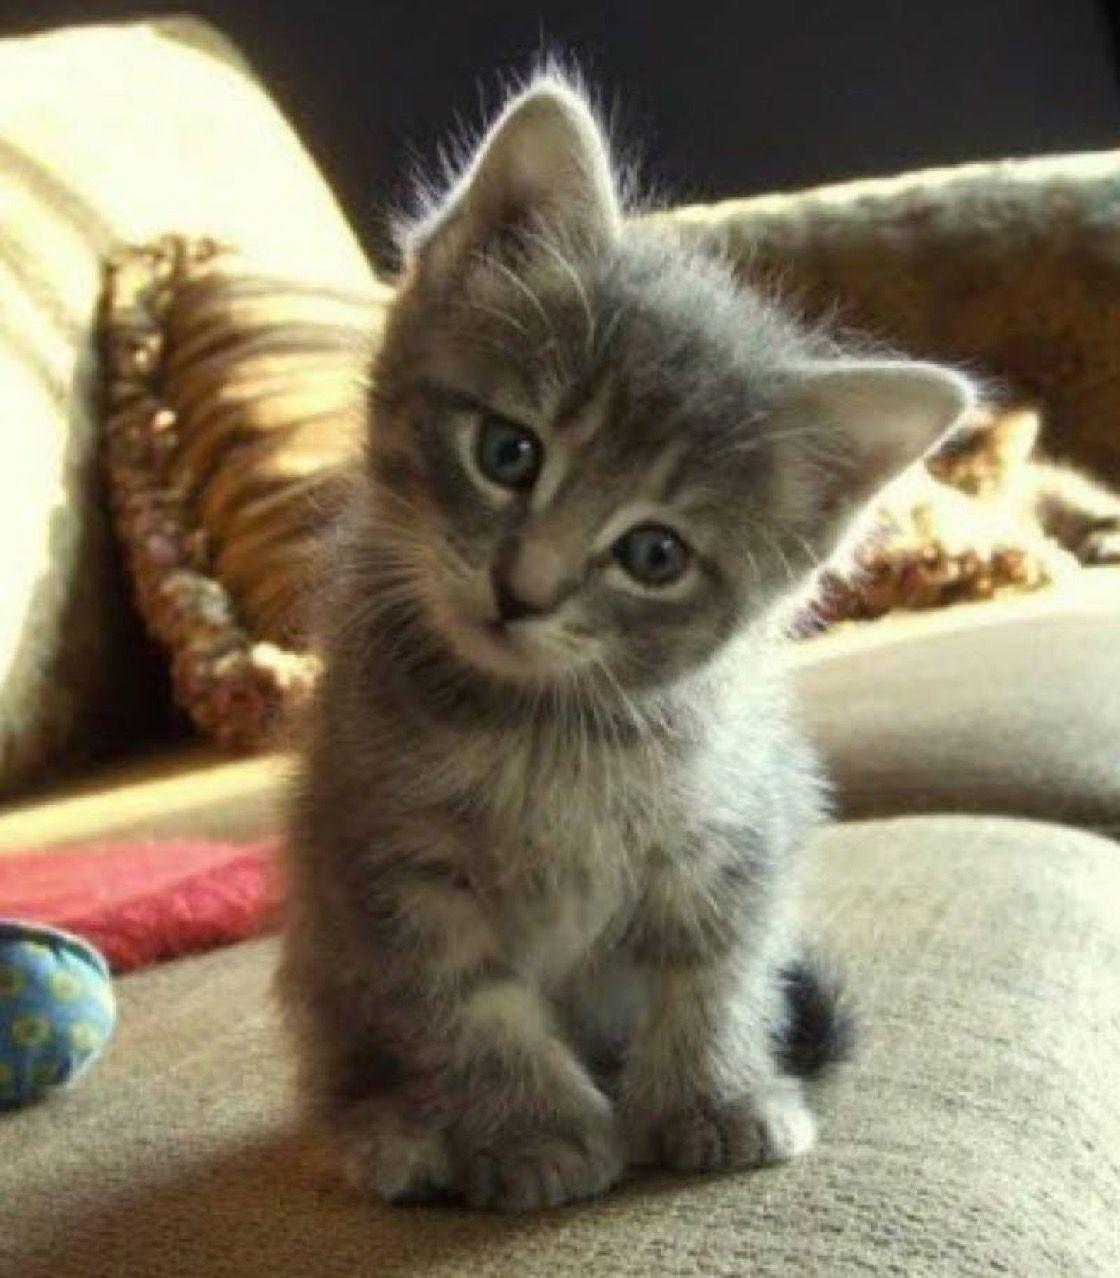 Pin by Rhonda Gilmore on Cute things ️ Kittens cutest